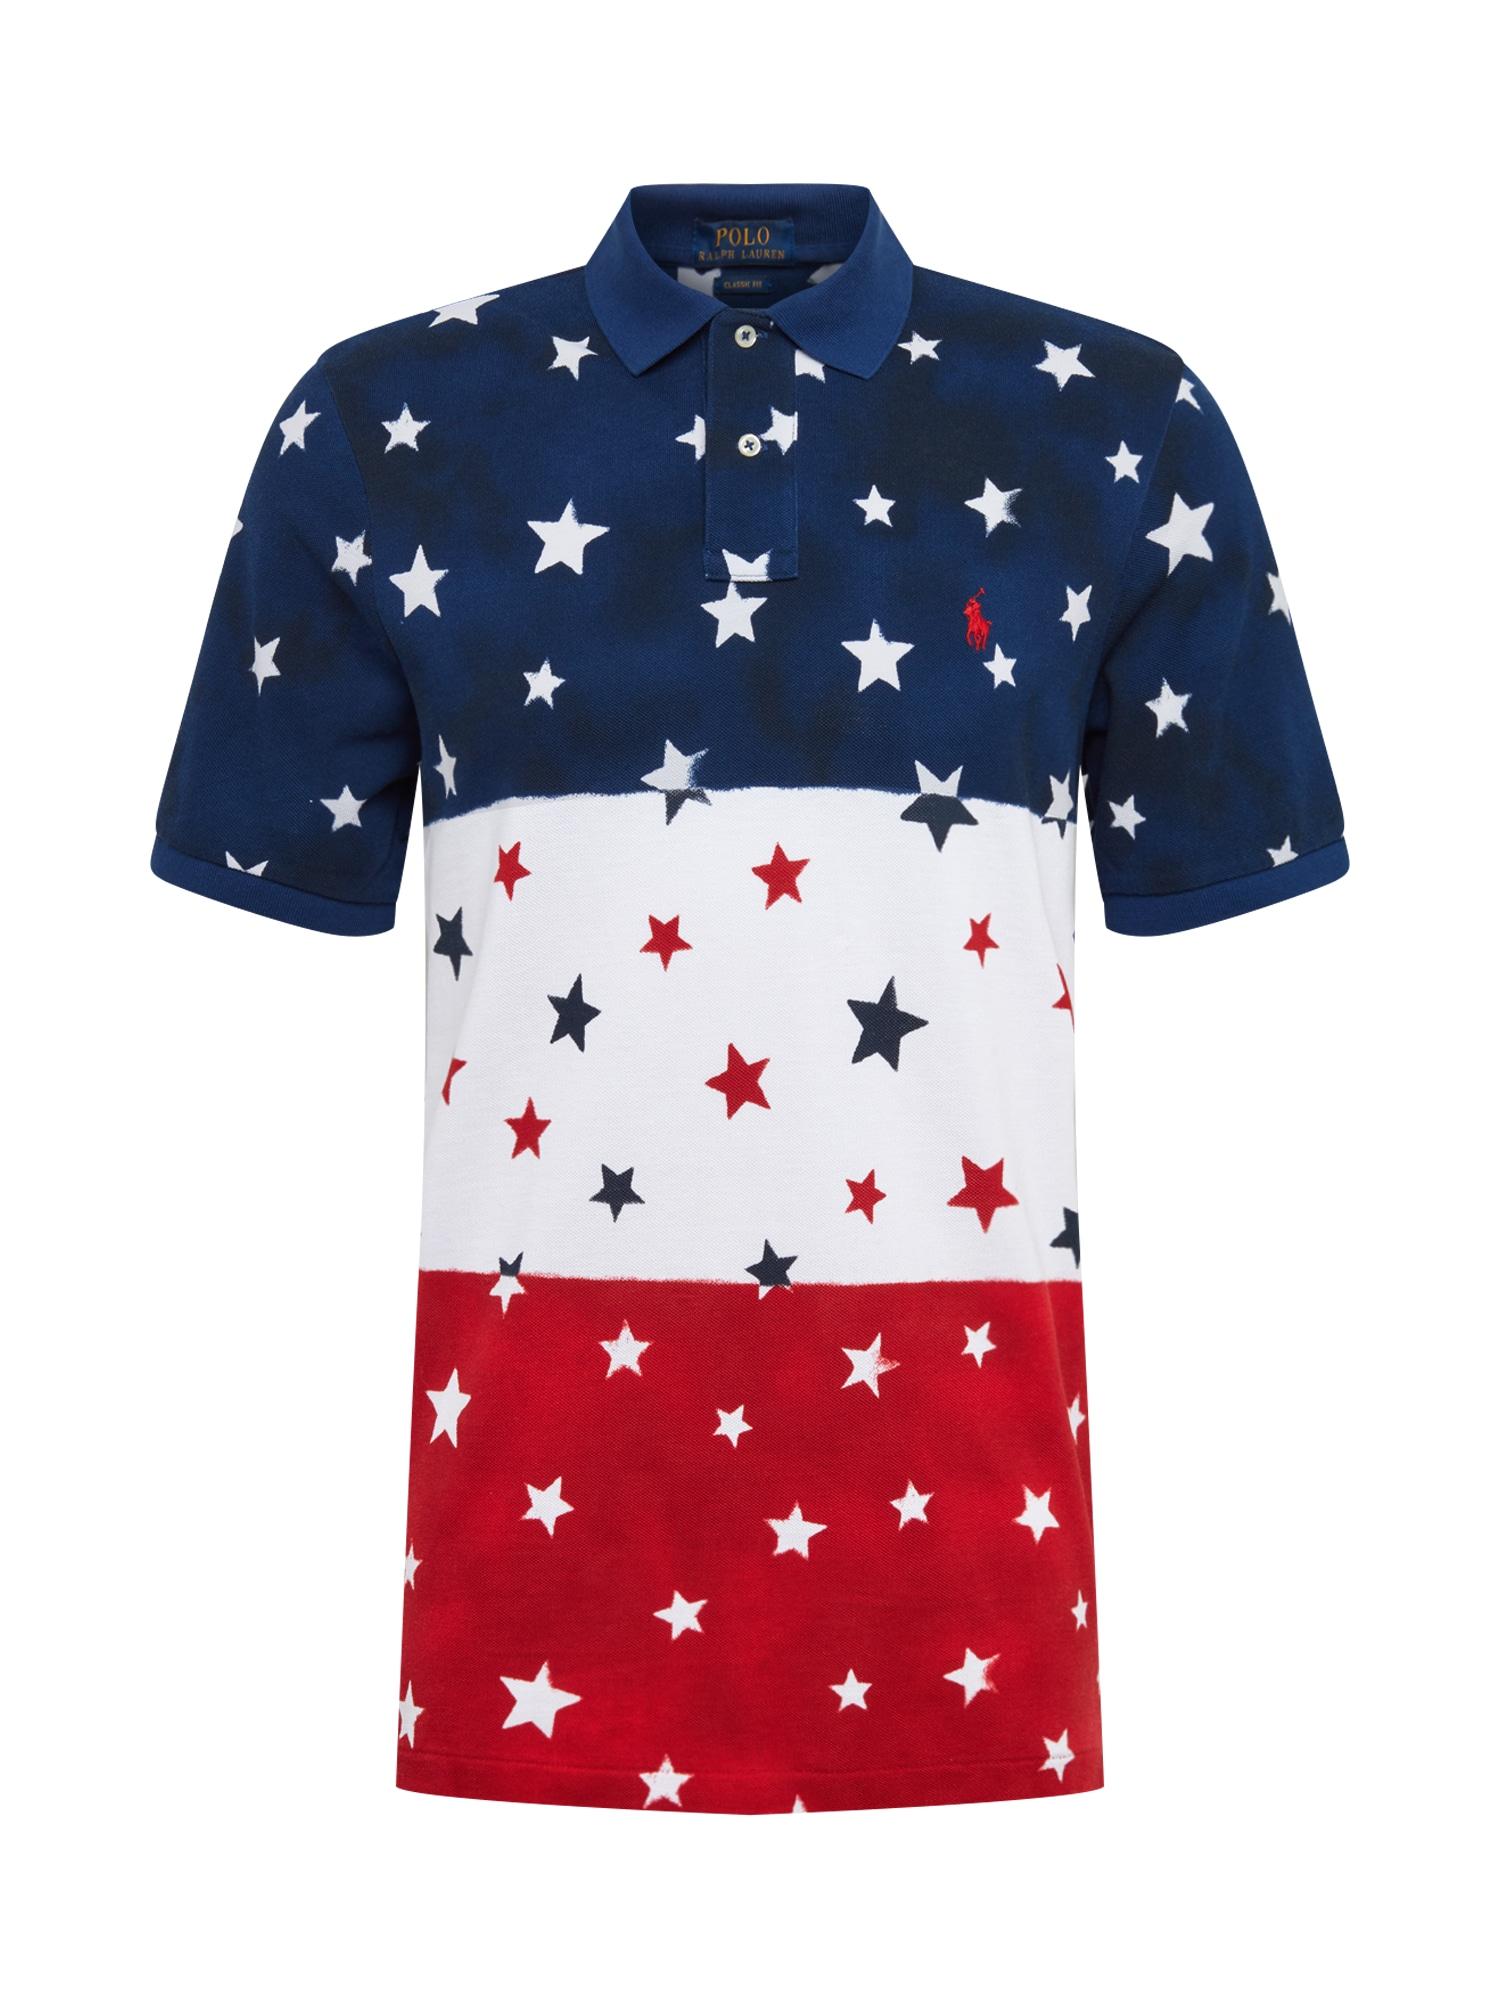 Tričko námořnická modř červená bílá POLO RALPH LAUREN